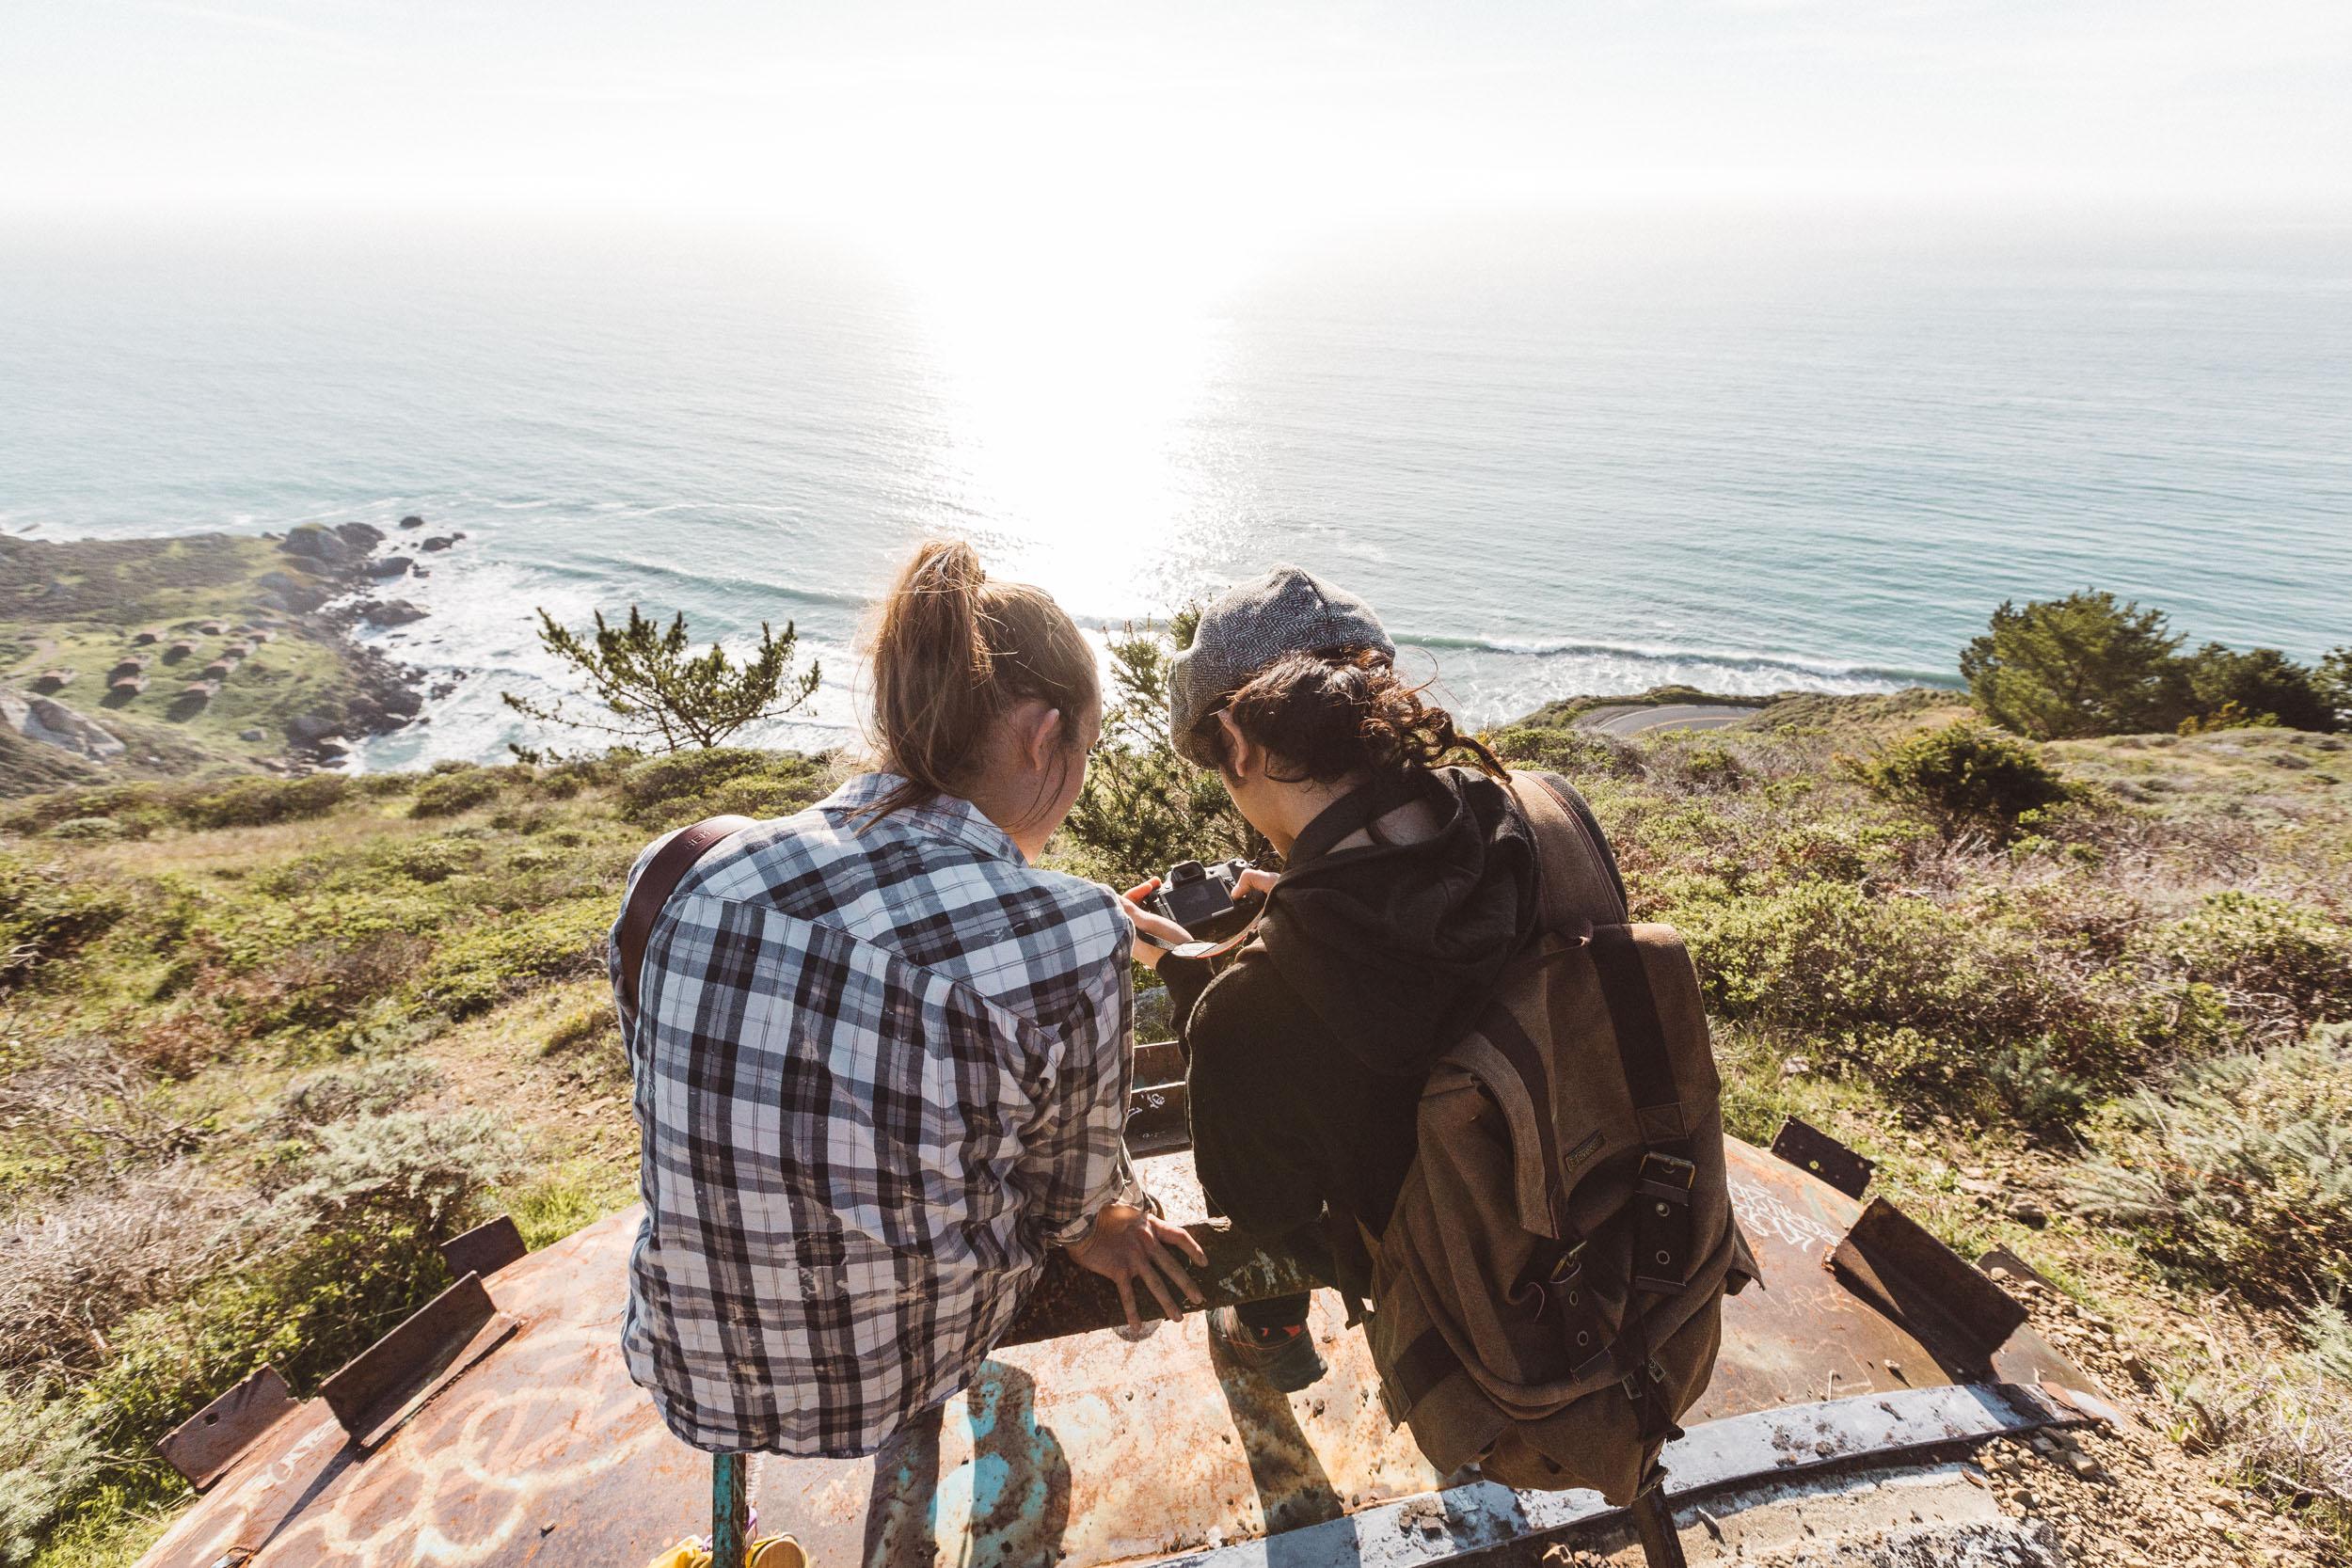 stinson-beach-vista-camera-hike-and-shoot-1.jpg